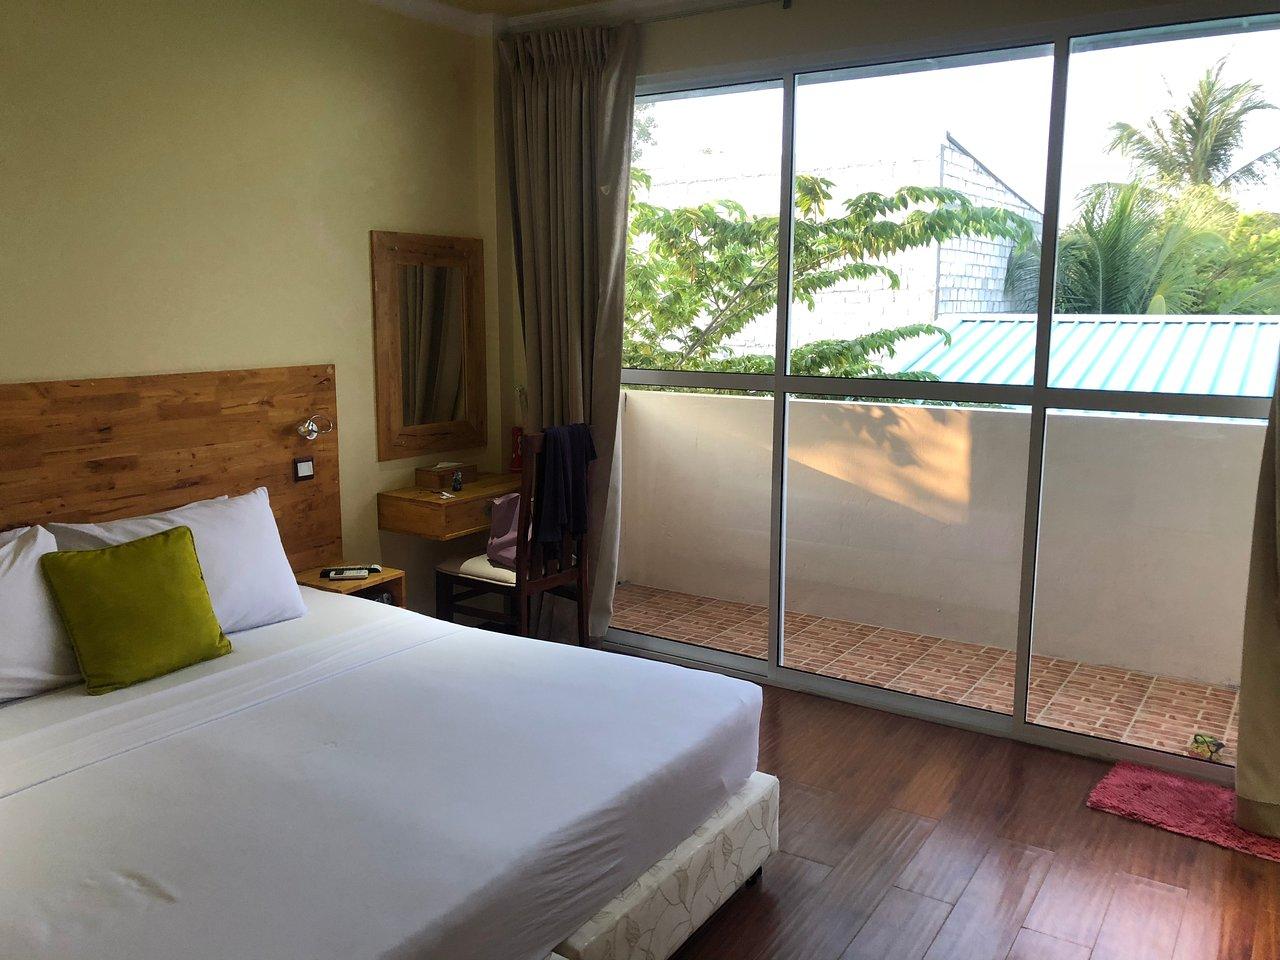 narnia maldives 41 5 4 prices hotel reviews maafushi rh tripadvisor com